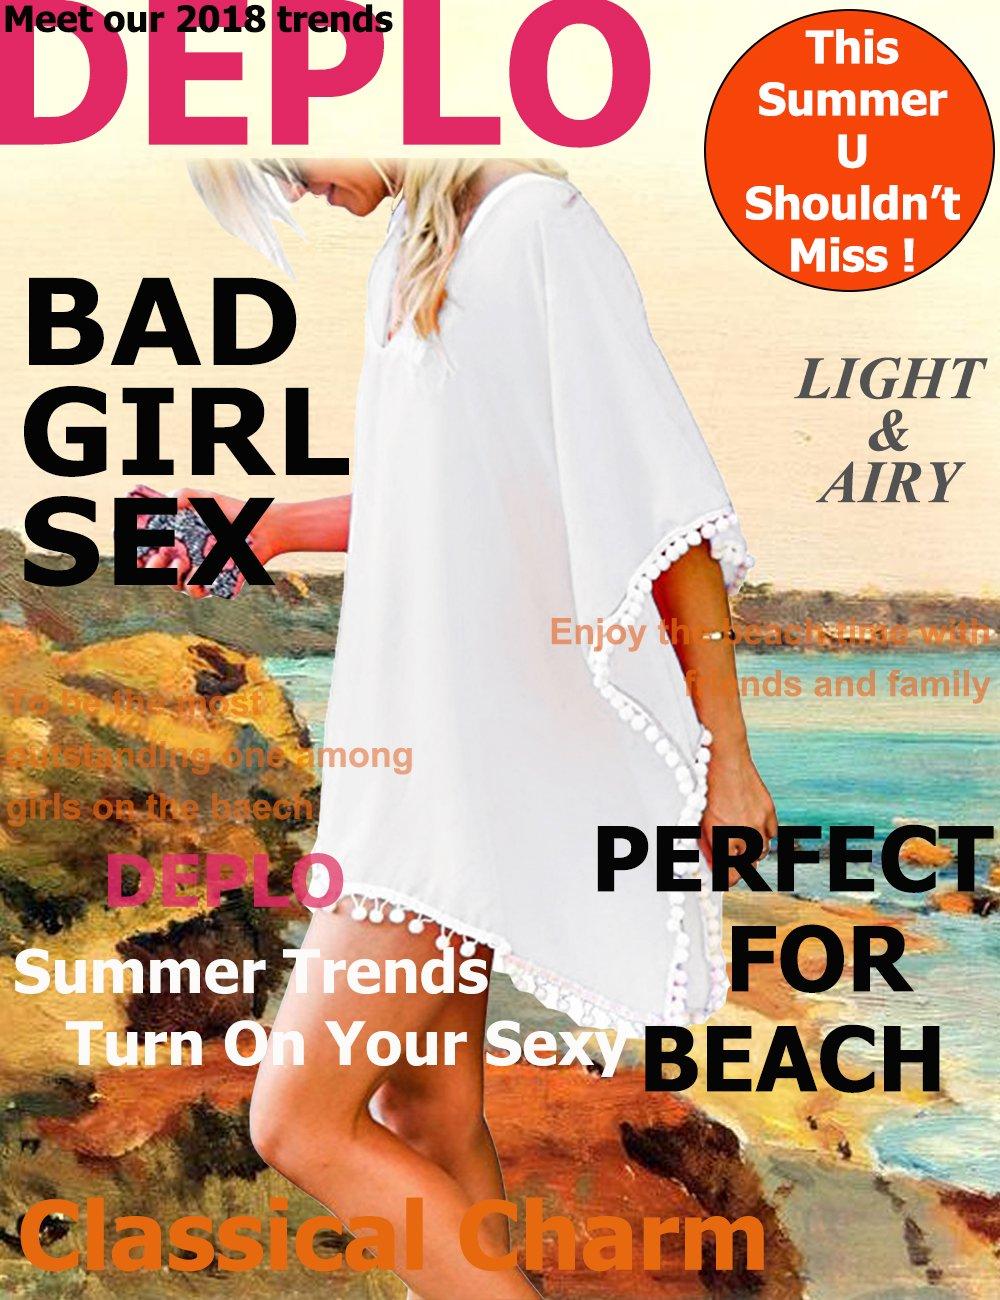 Women's Pom Pom Trim Kaftan Chiffon Swimwear Beach Cover up Bathing Suit Swimwear Bikini Swimsuit Beachwear Dress Shirt by DEPLO (Image #2)